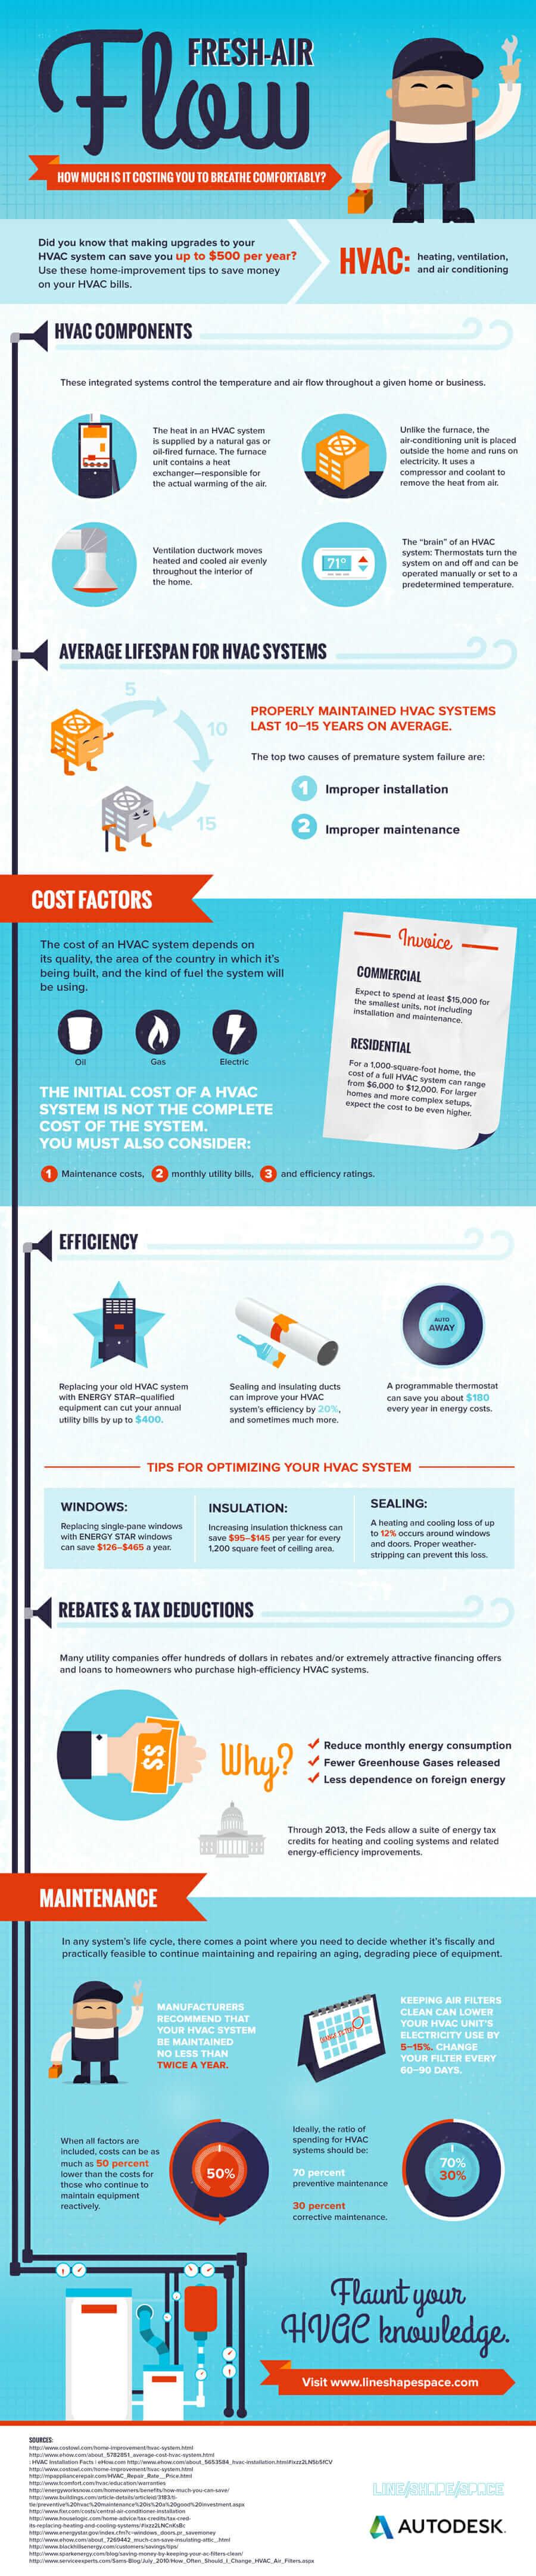 hvac-infographic